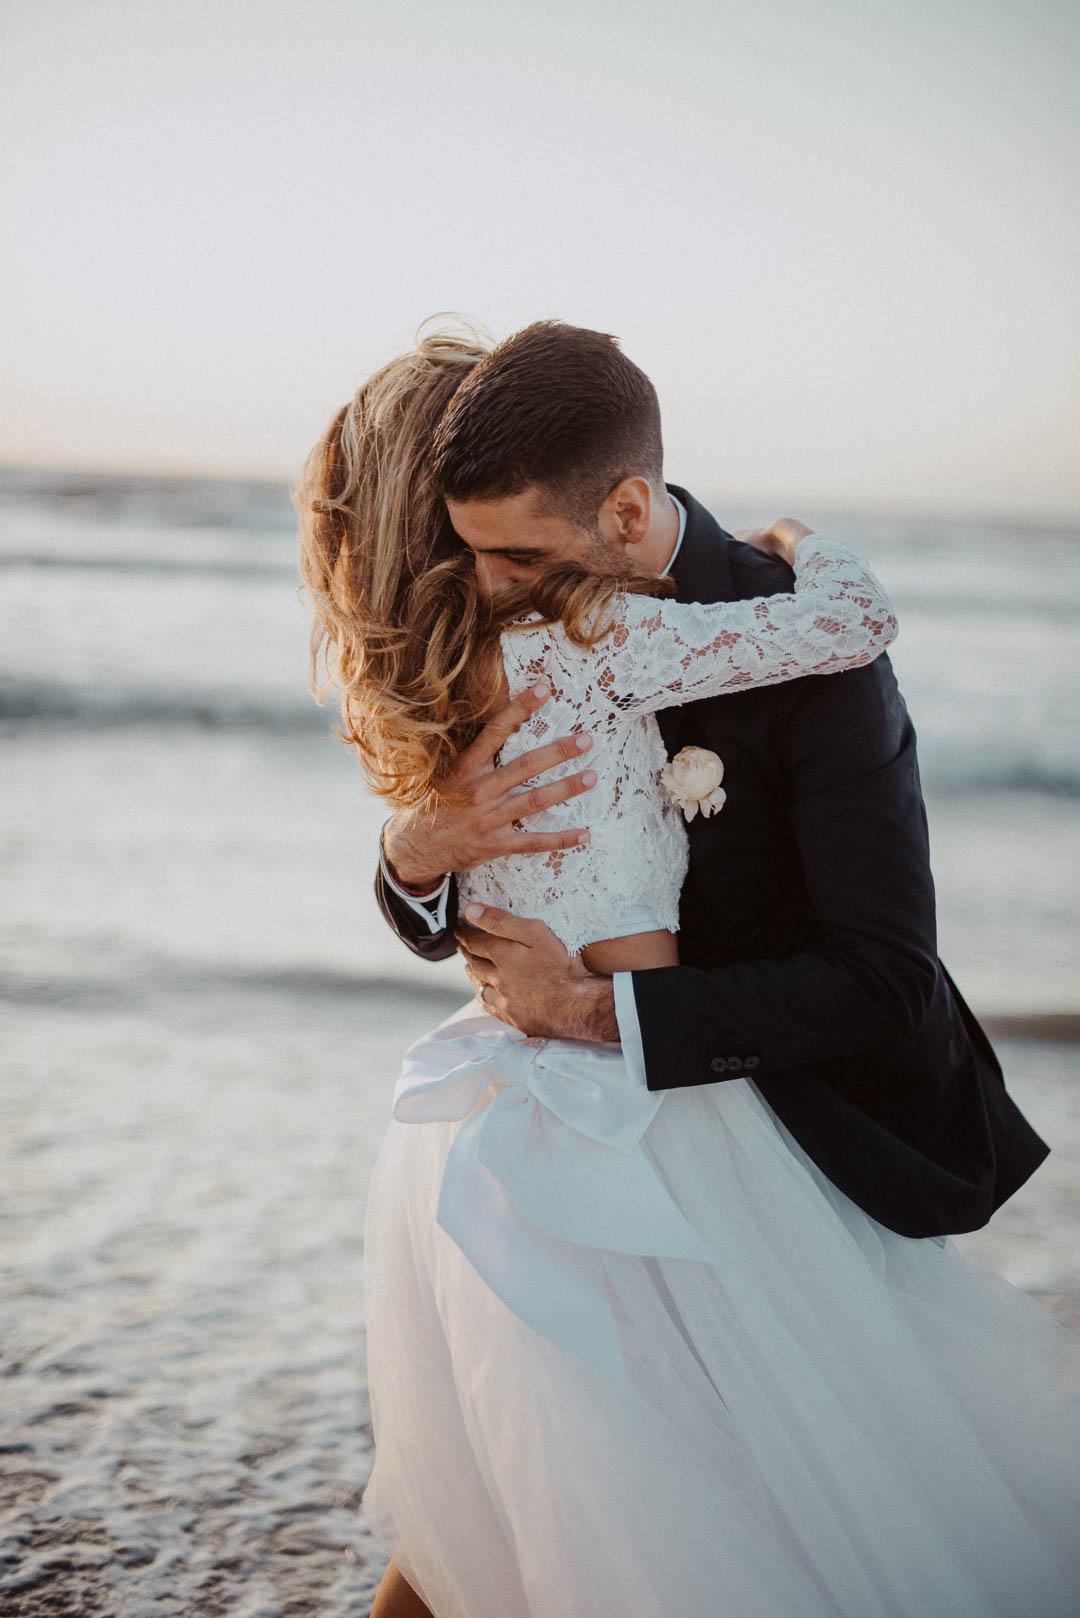 wedding-photographer-destination-fineart-bespoke-reportage-napoli-nabilah-vivianeizzo-spazio46-120